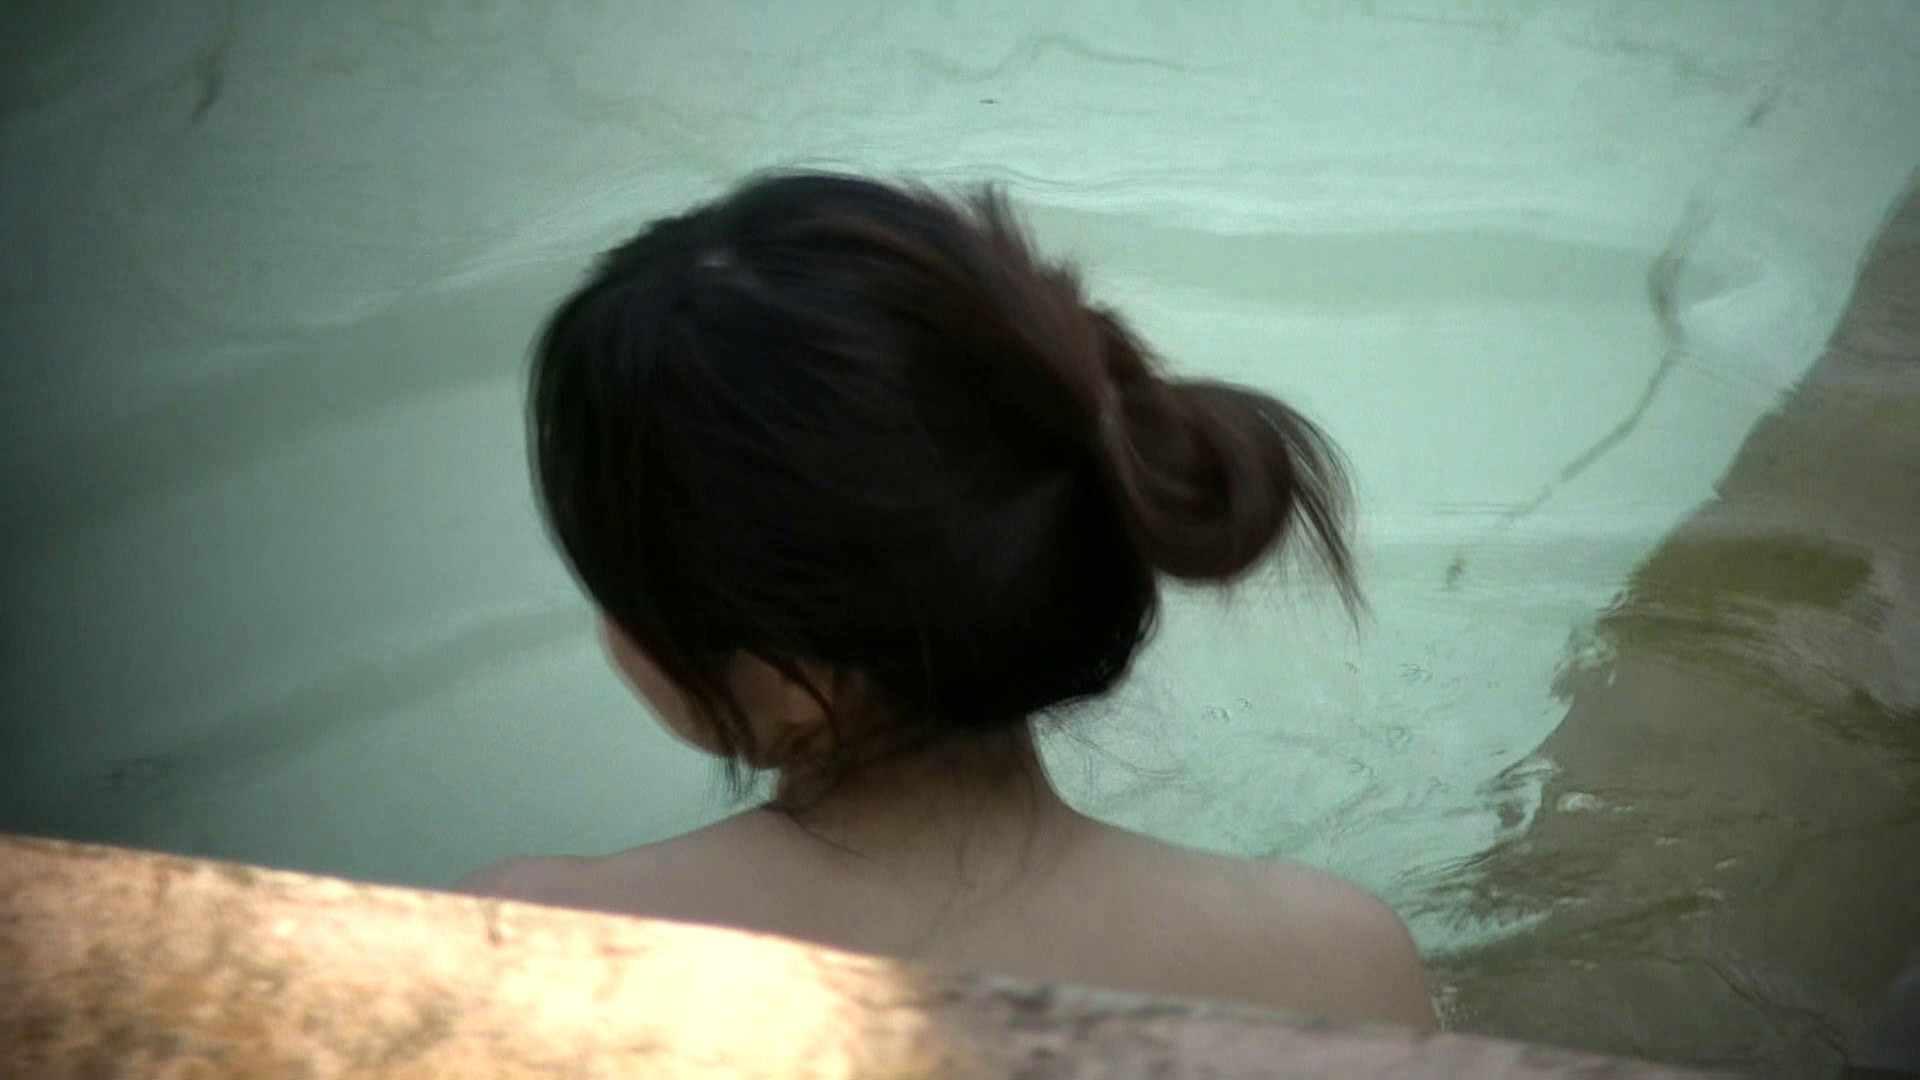 Aquaな露天風呂Vol.652 盗撮 | HなOL  105pic 24